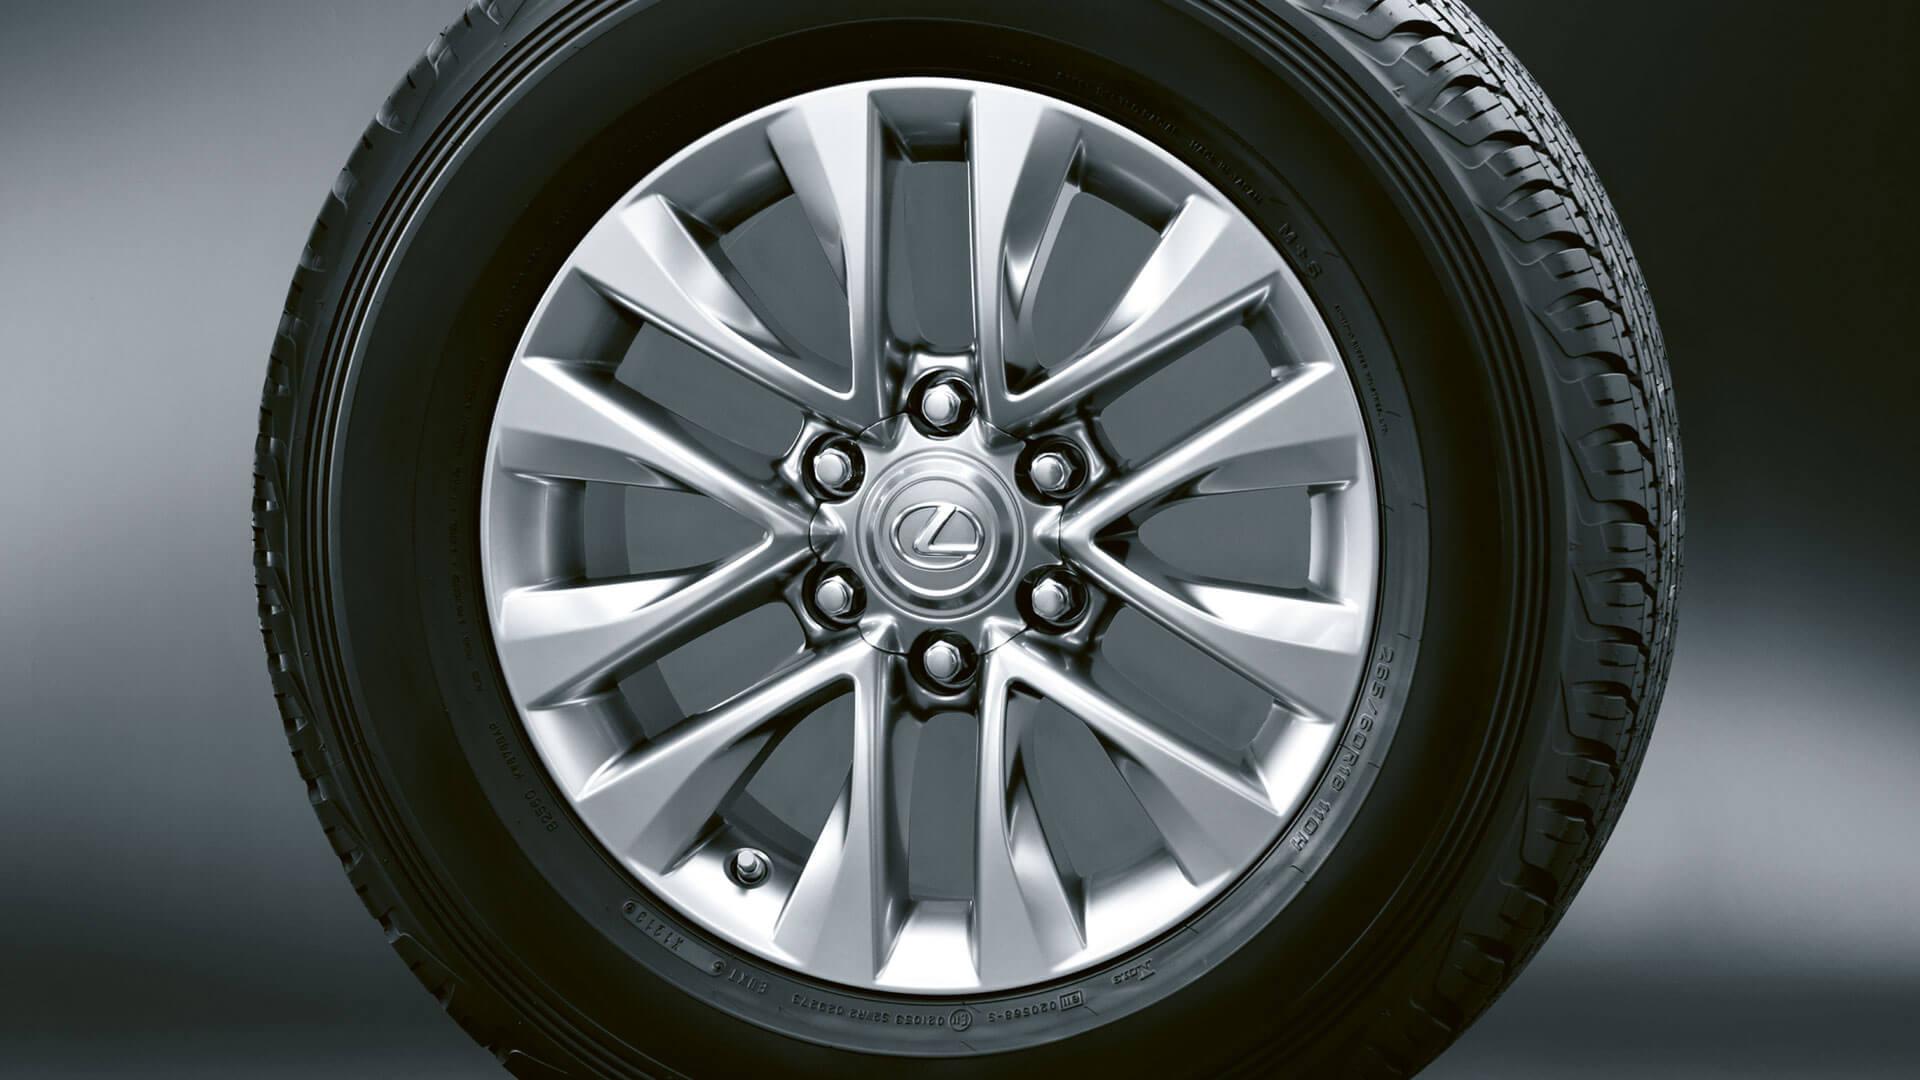 2019 lexus gx hotspot 18 inch alloy wheels